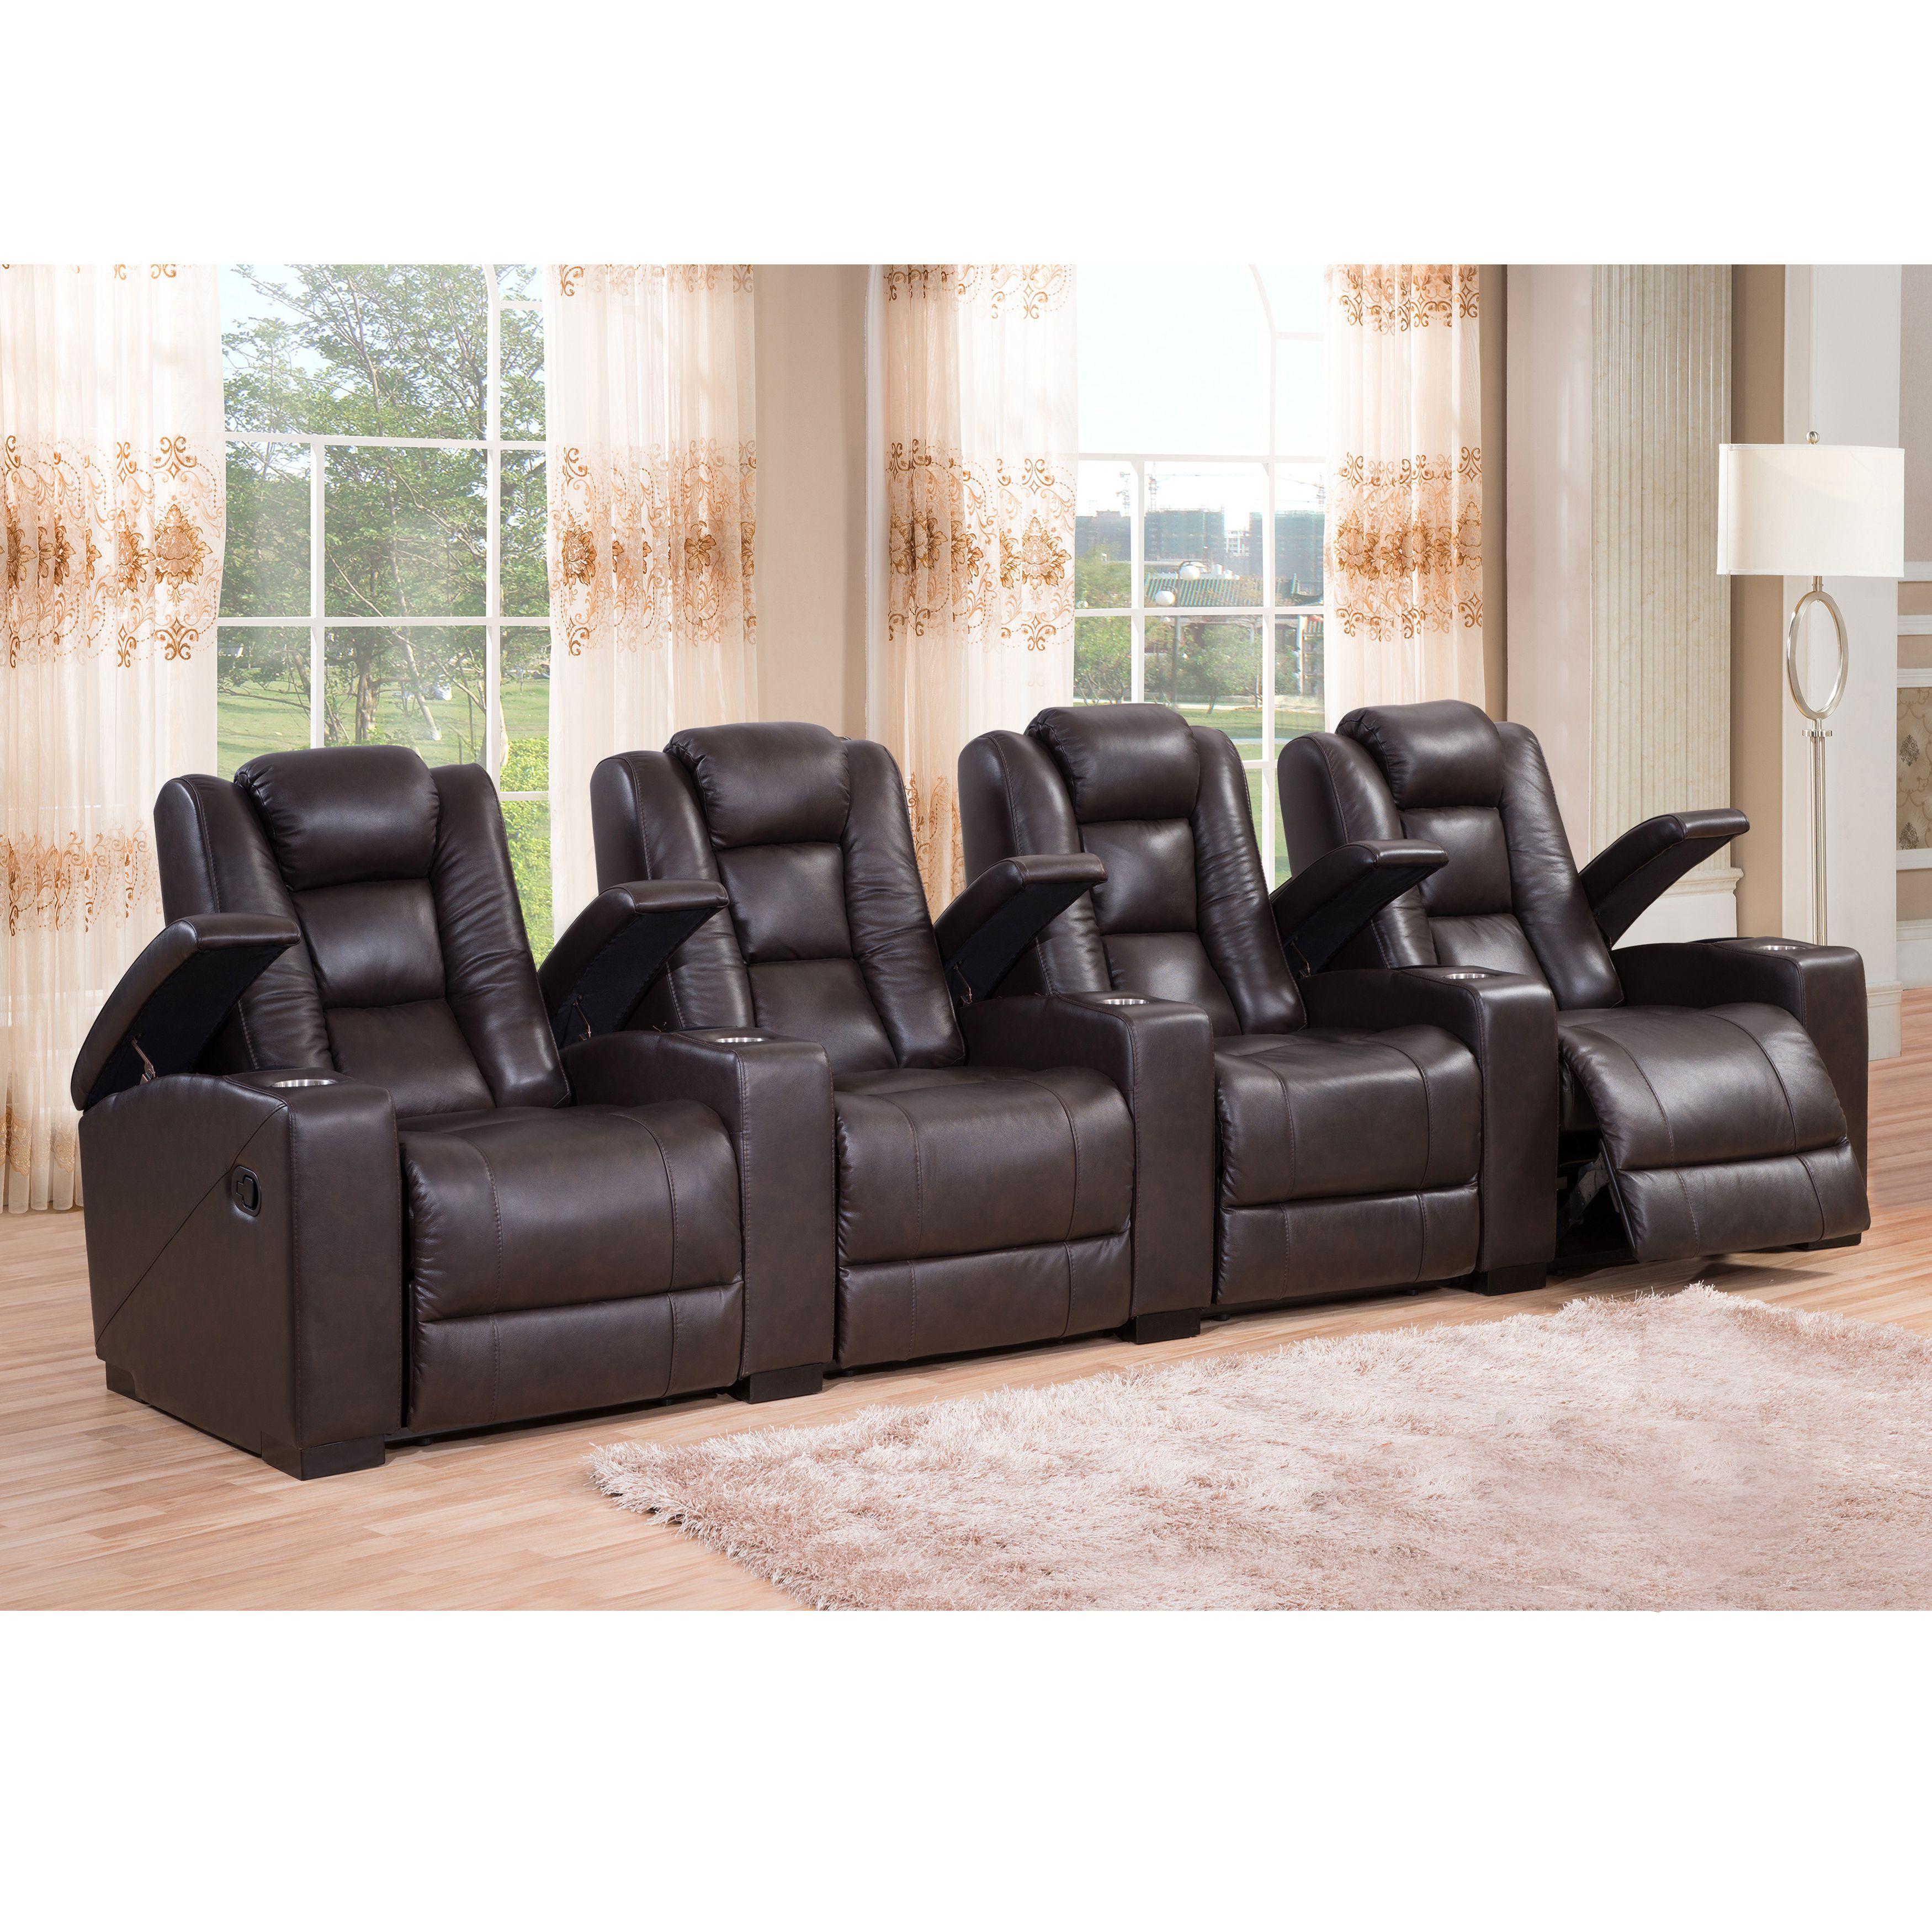 home theater sofas uk bjs reclining sofa black friday weston four seat top grain recliner seating